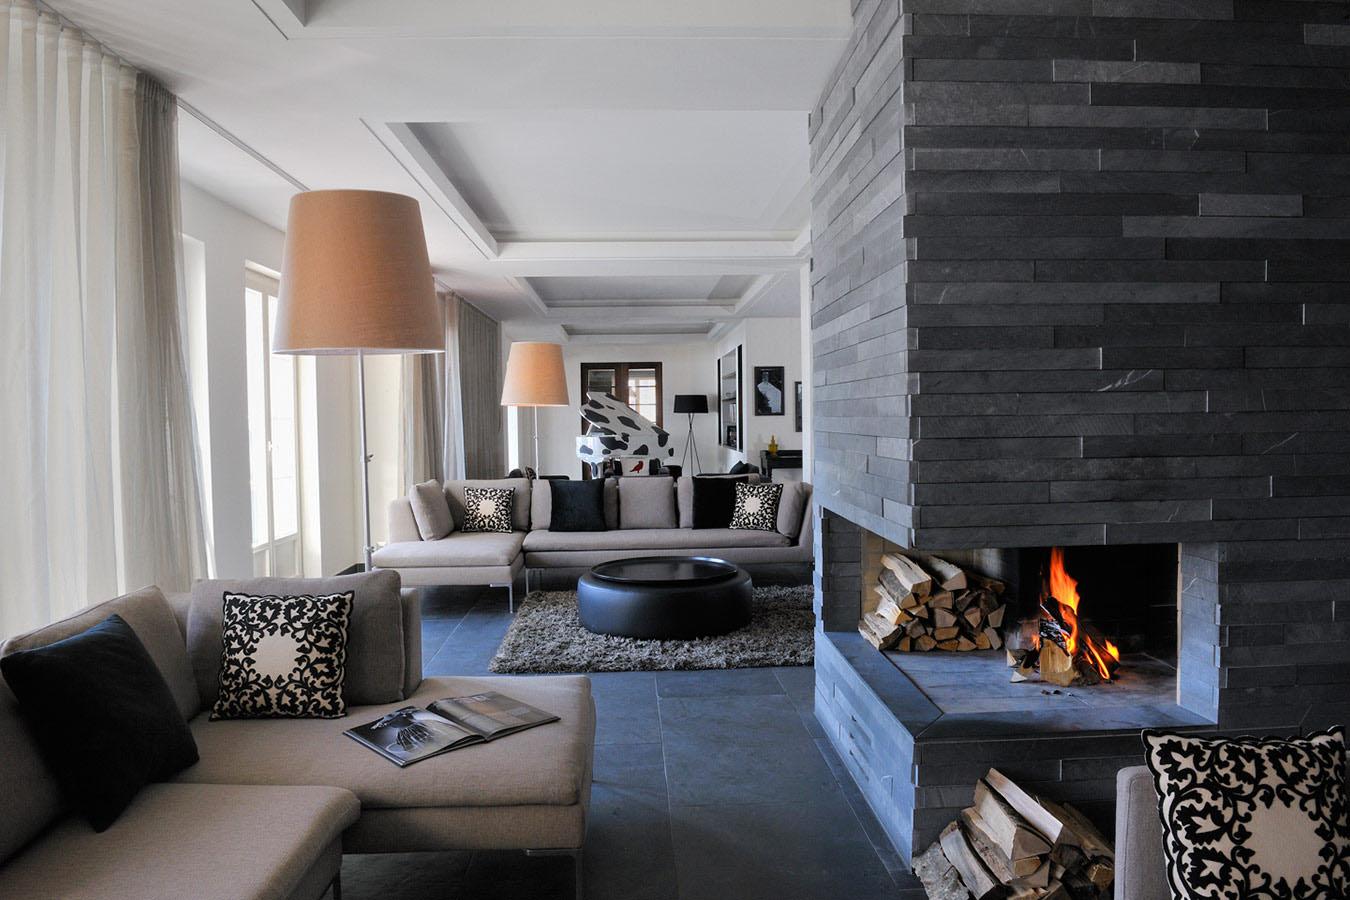 Elegant Swiss Alps Hotel Room